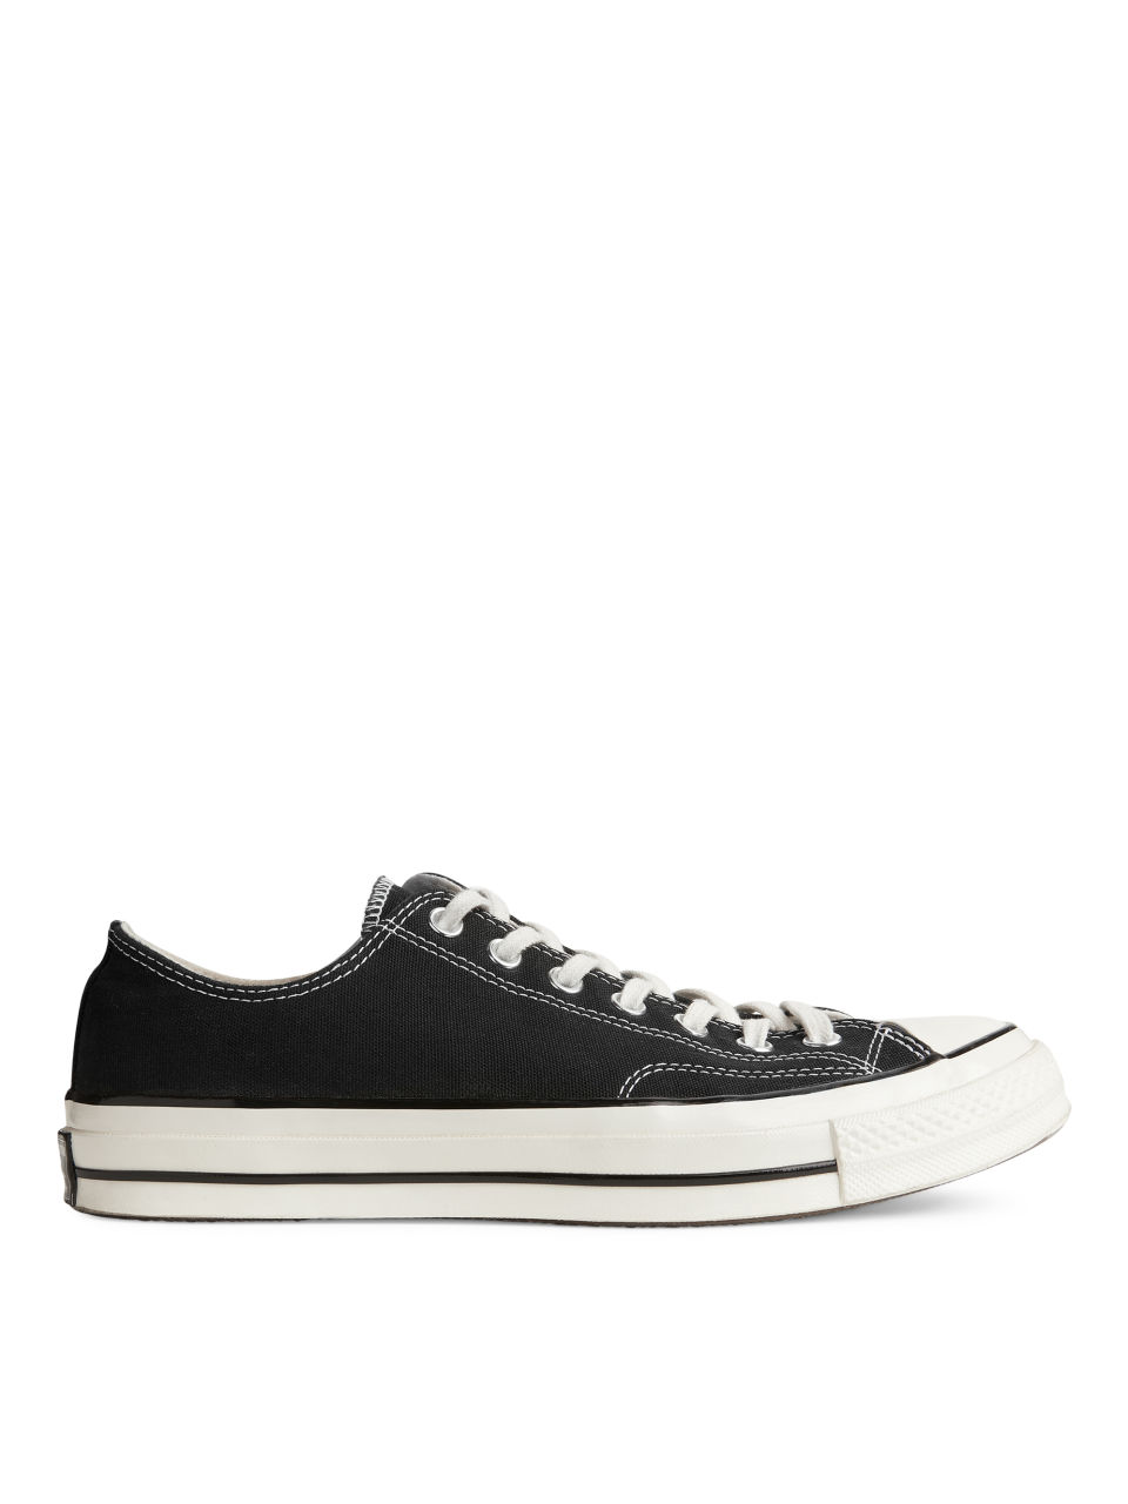 sports shoes 602b3 bb308 Converse Chuck Taylor All Star 70 - Black - Shoes - ARKET